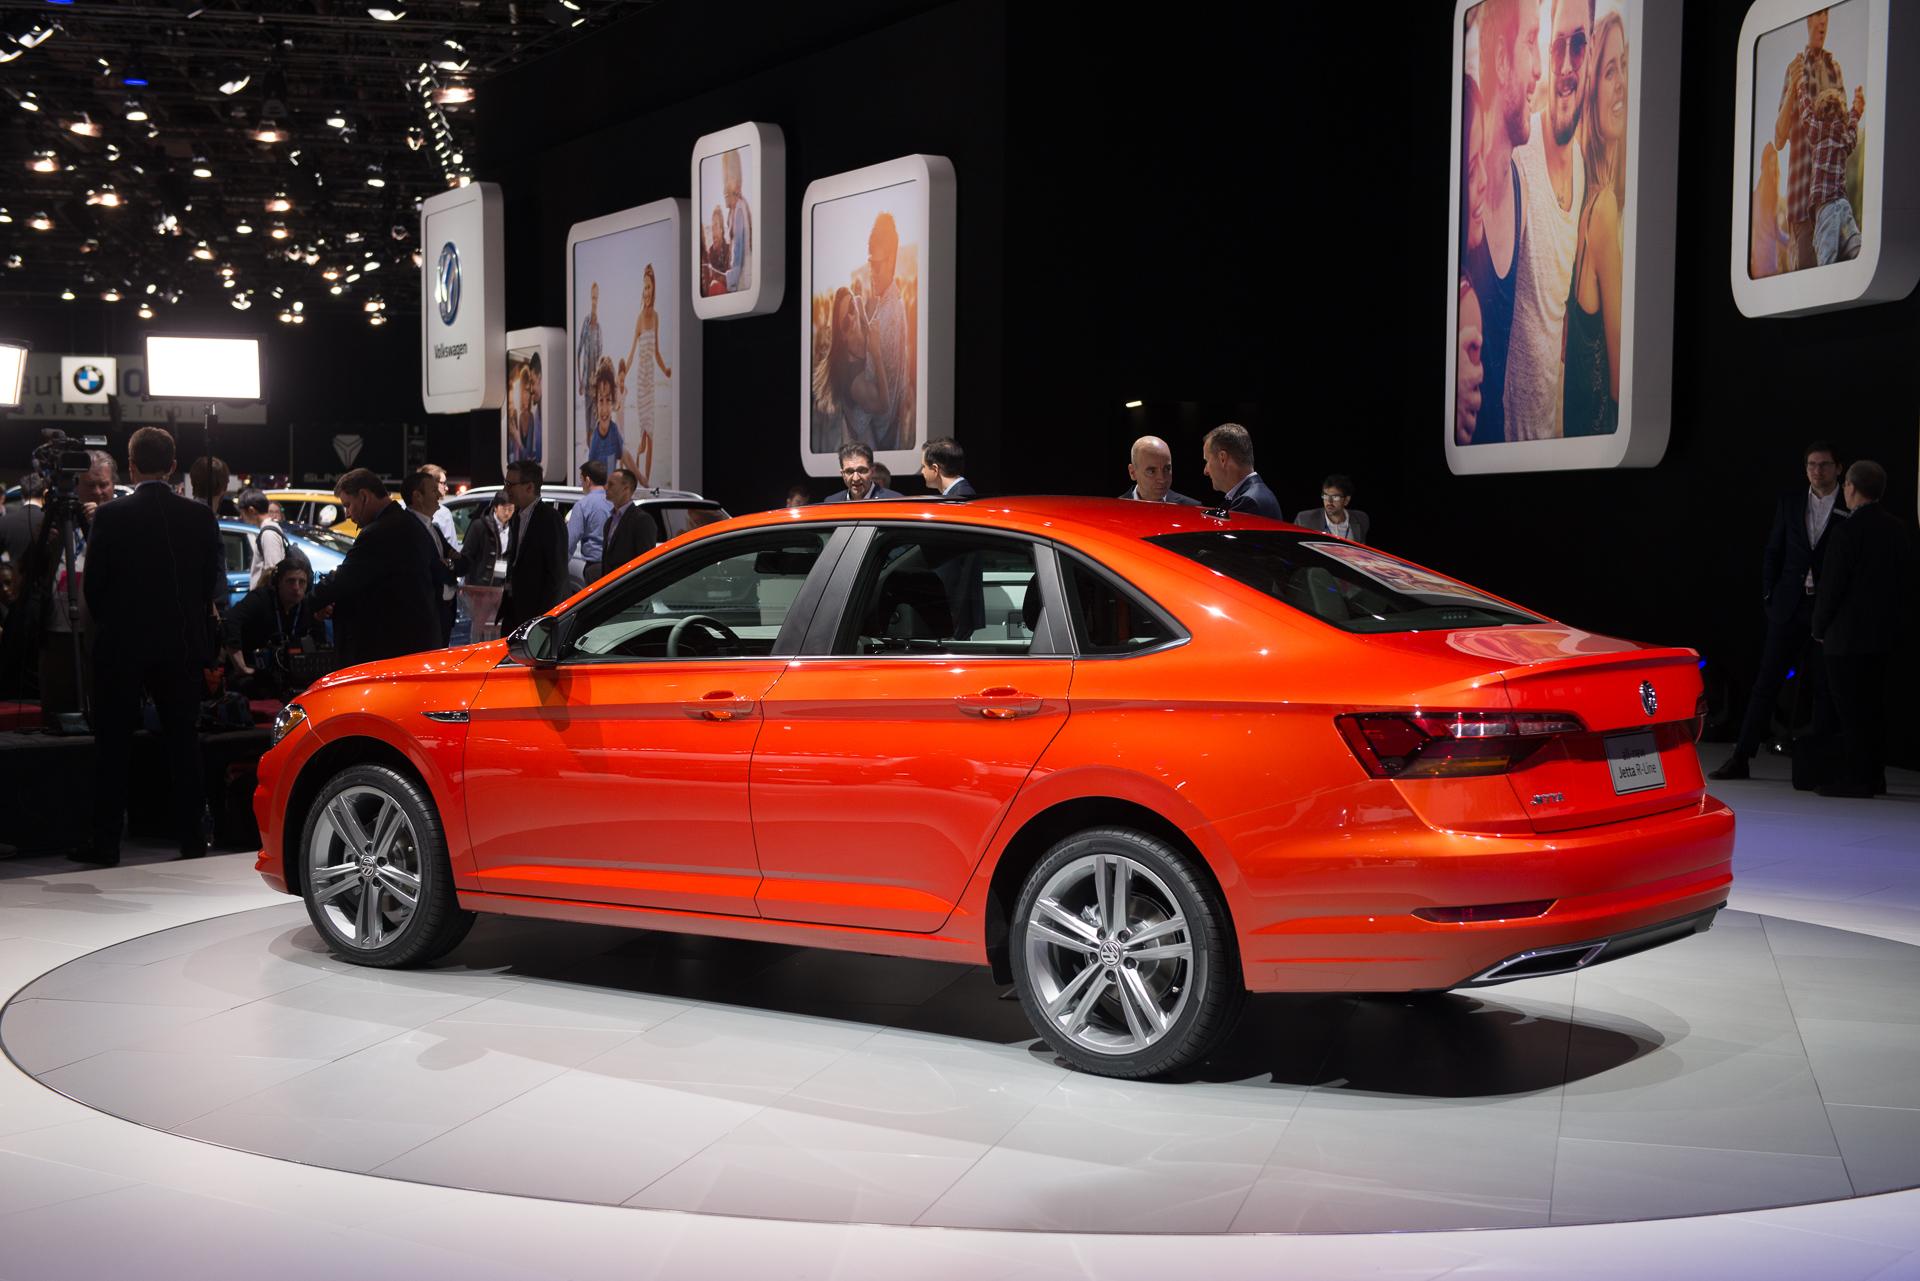 2019 volkswagen jetta revealed compact sedan pushes for mid size taste publicscrutiny Gallery